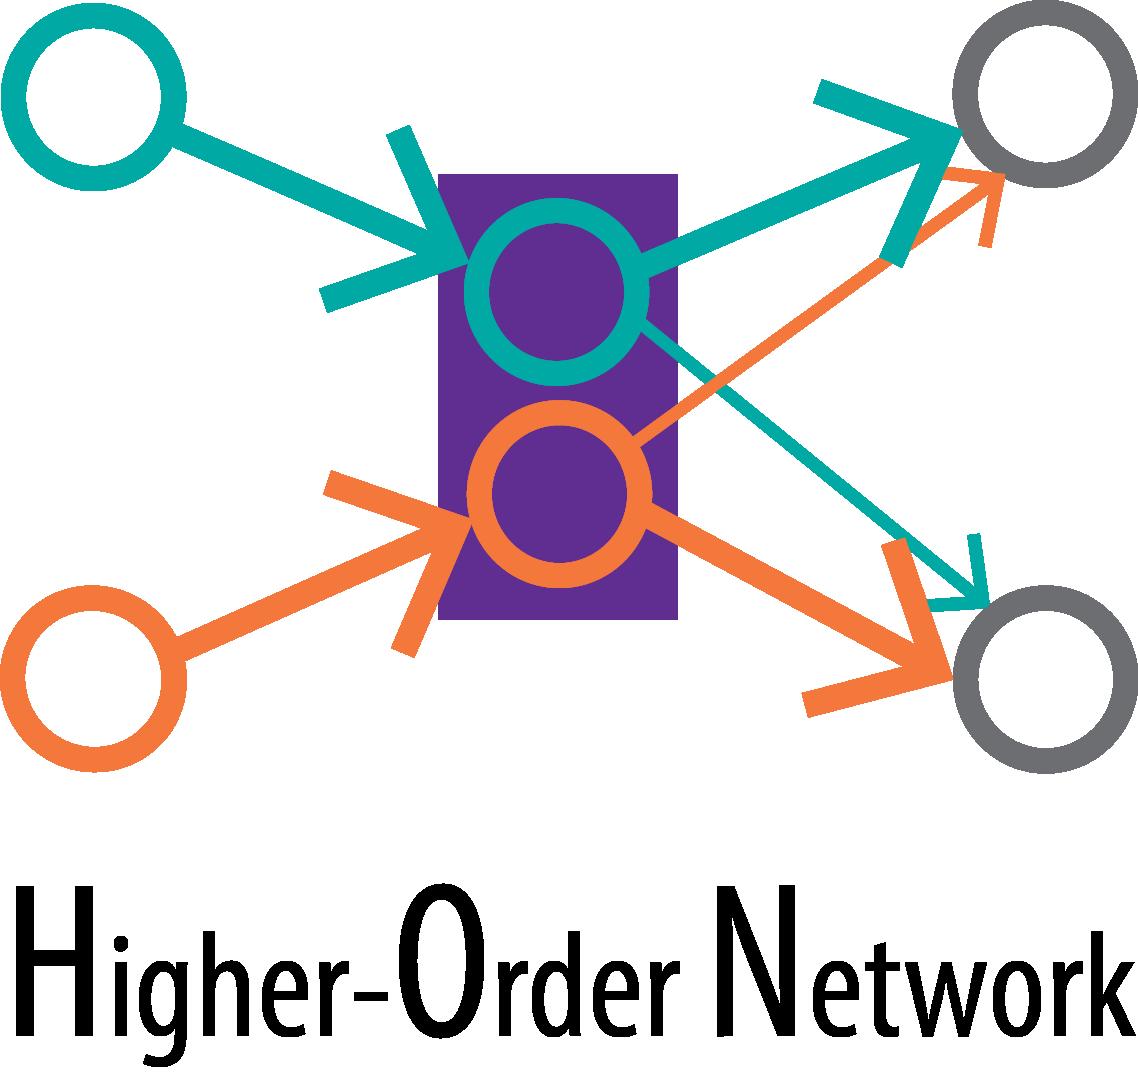 Higher-order network